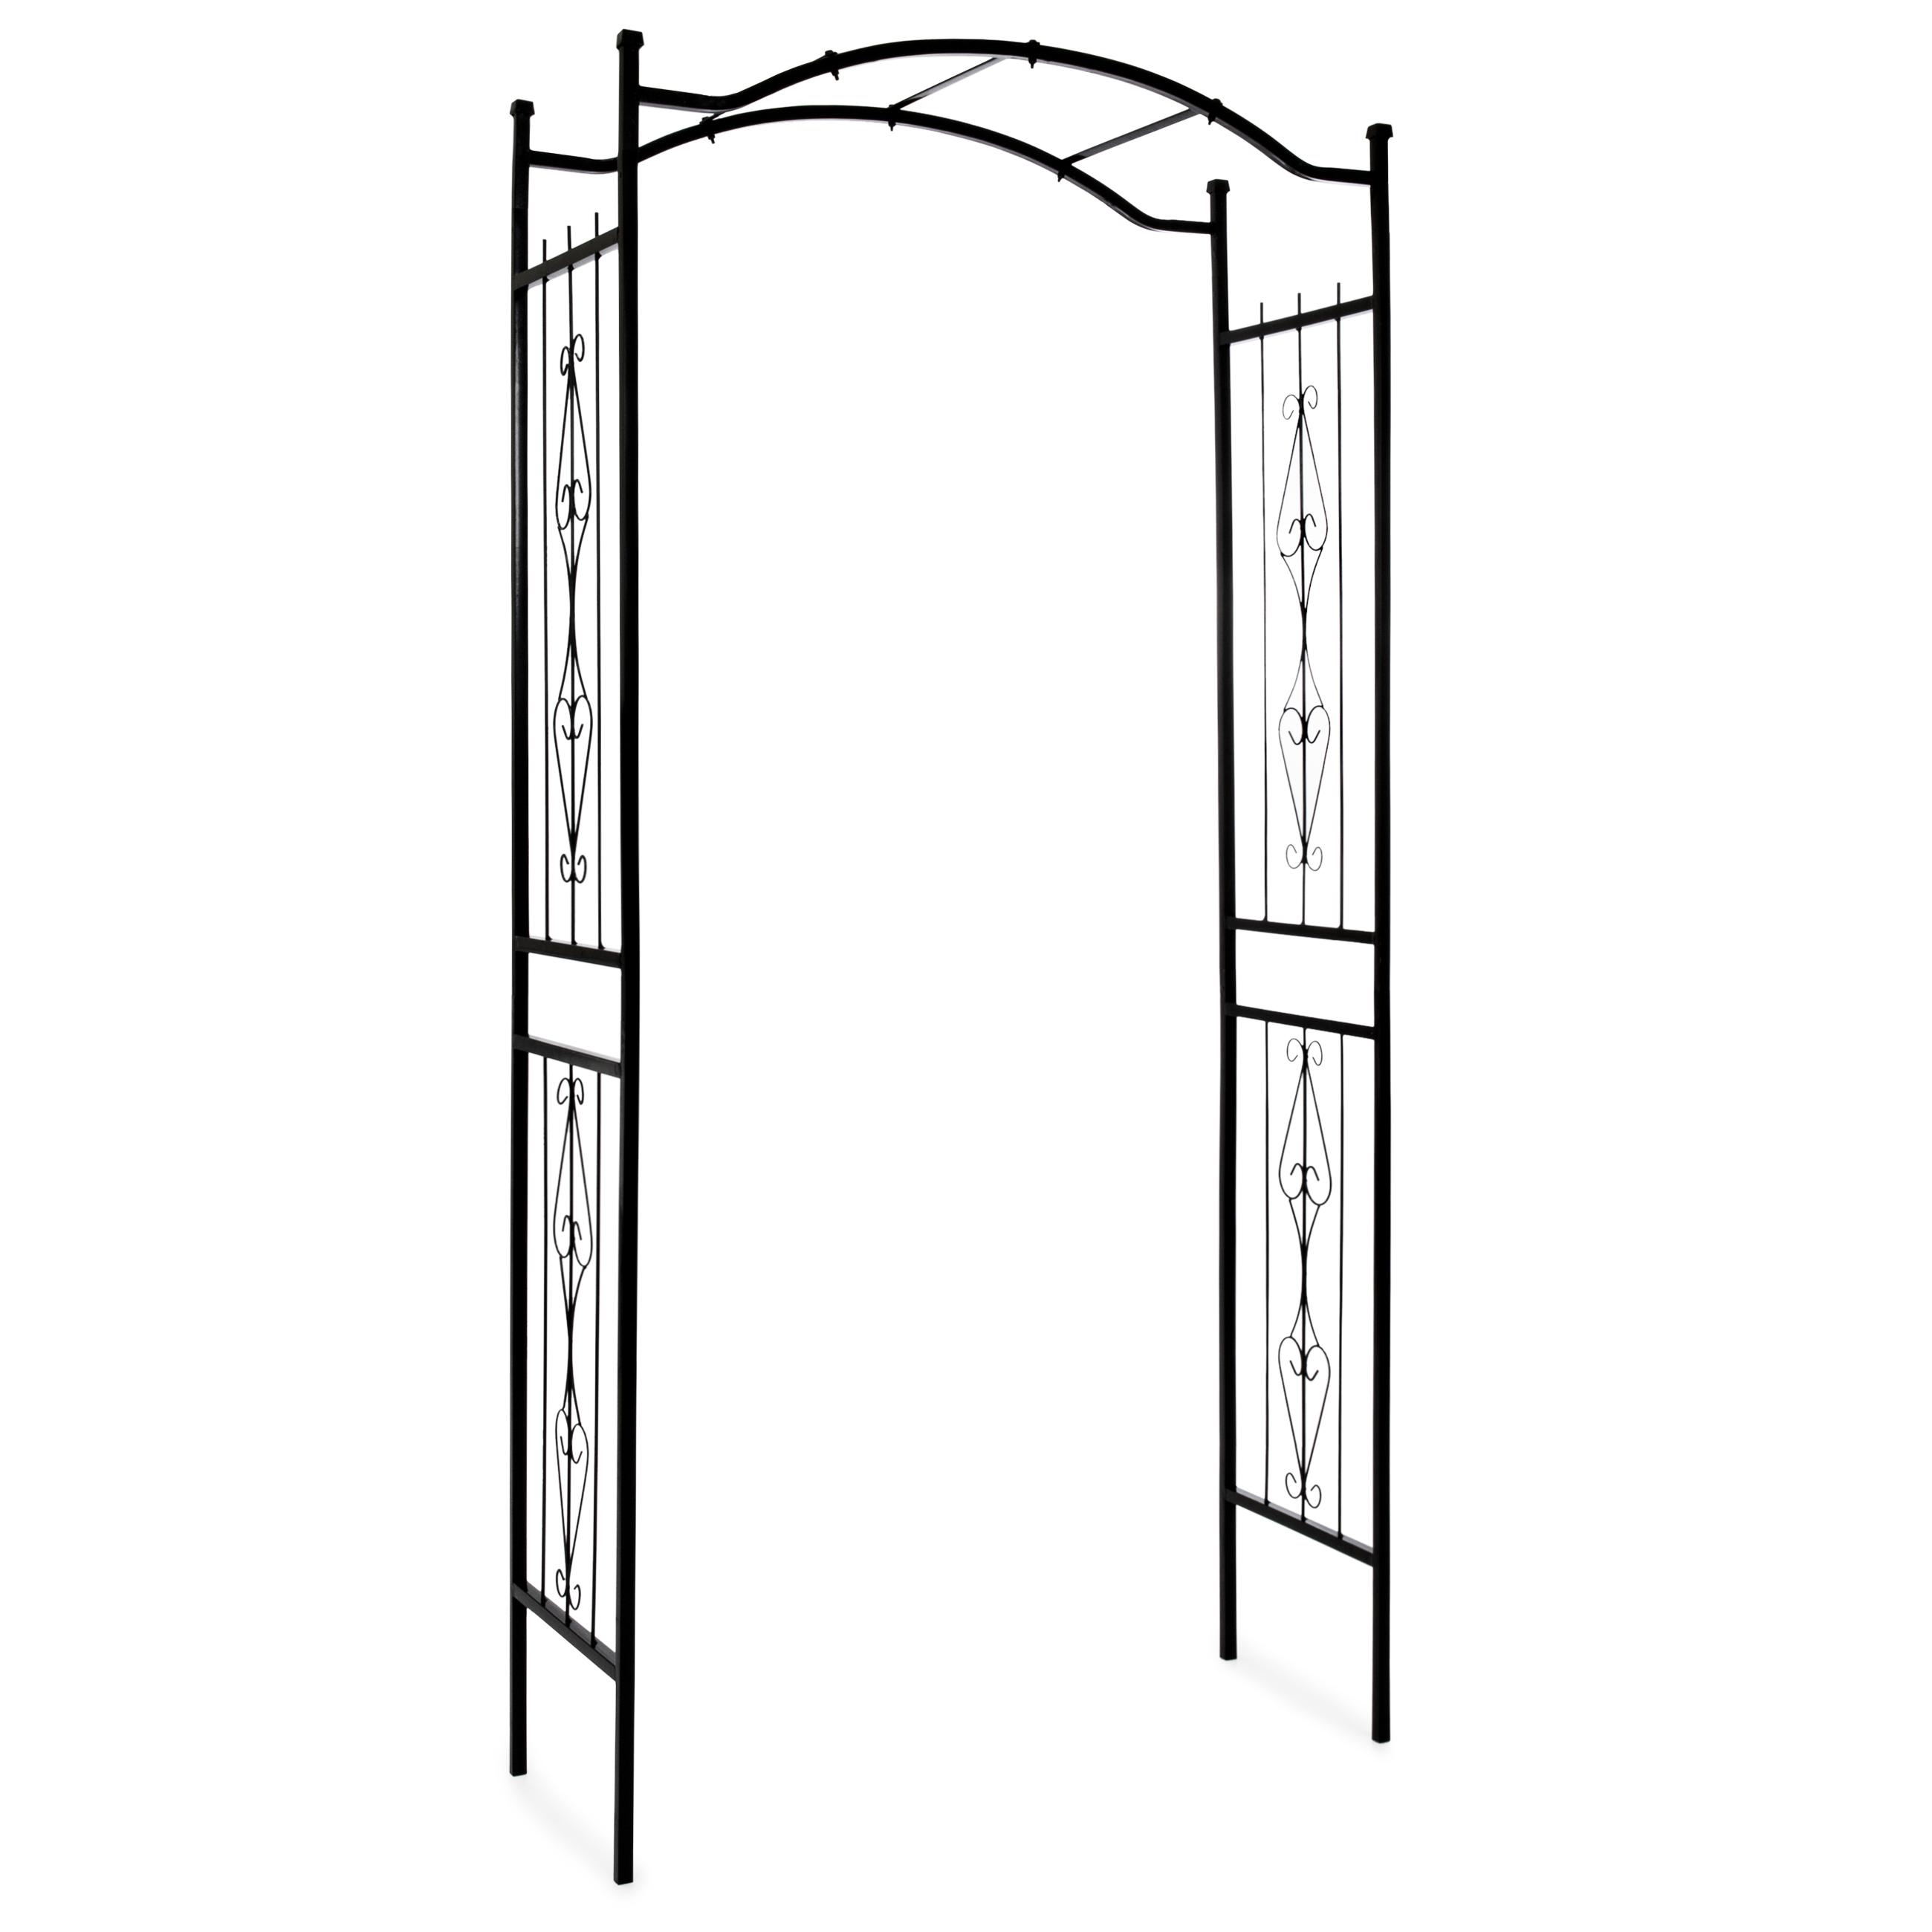 Best Choice Products Steel Garden Arch Arbor Decorative Climbing Plant Trellis (Black) by